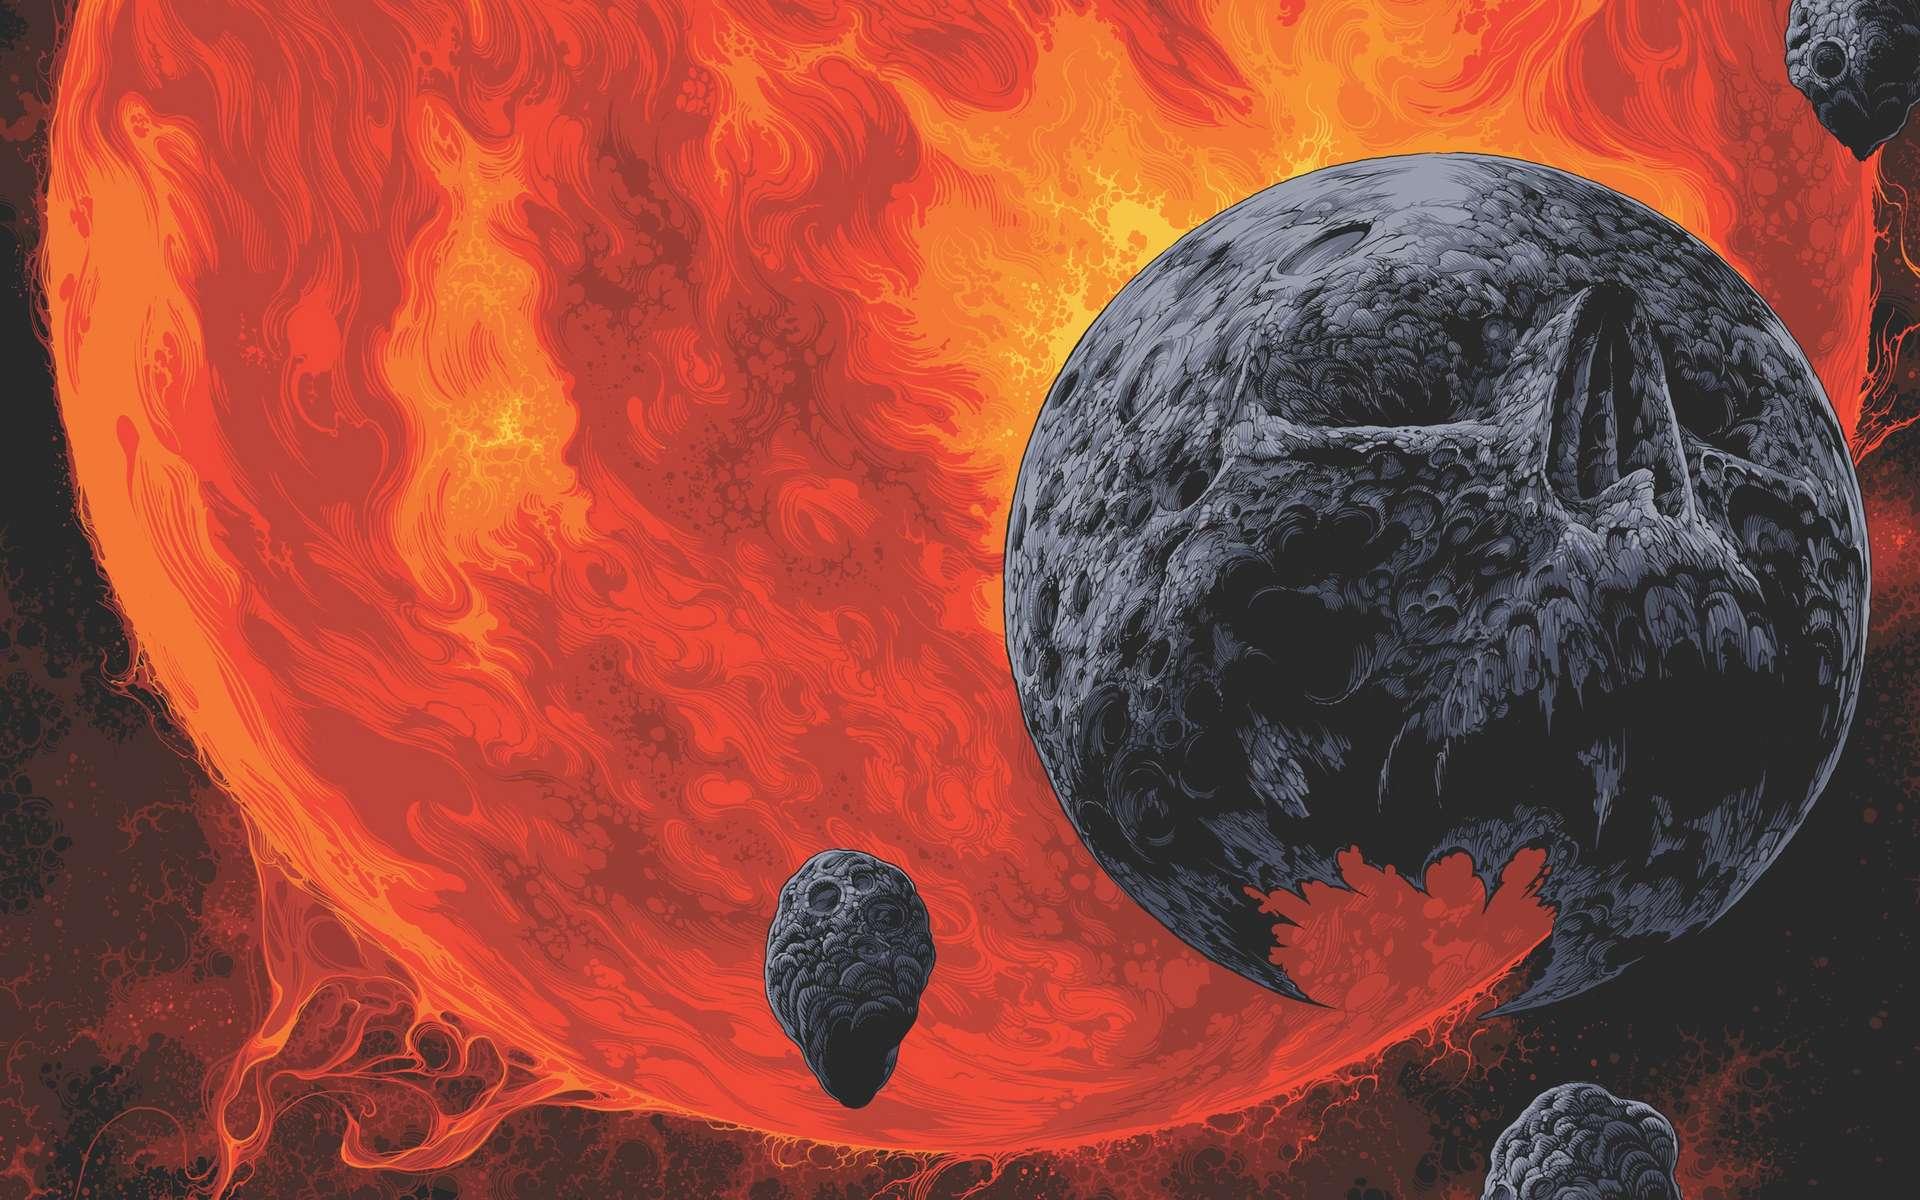 Extrait de l'affiche Galactic Graveyard. © Nasa, JPL-Caltech